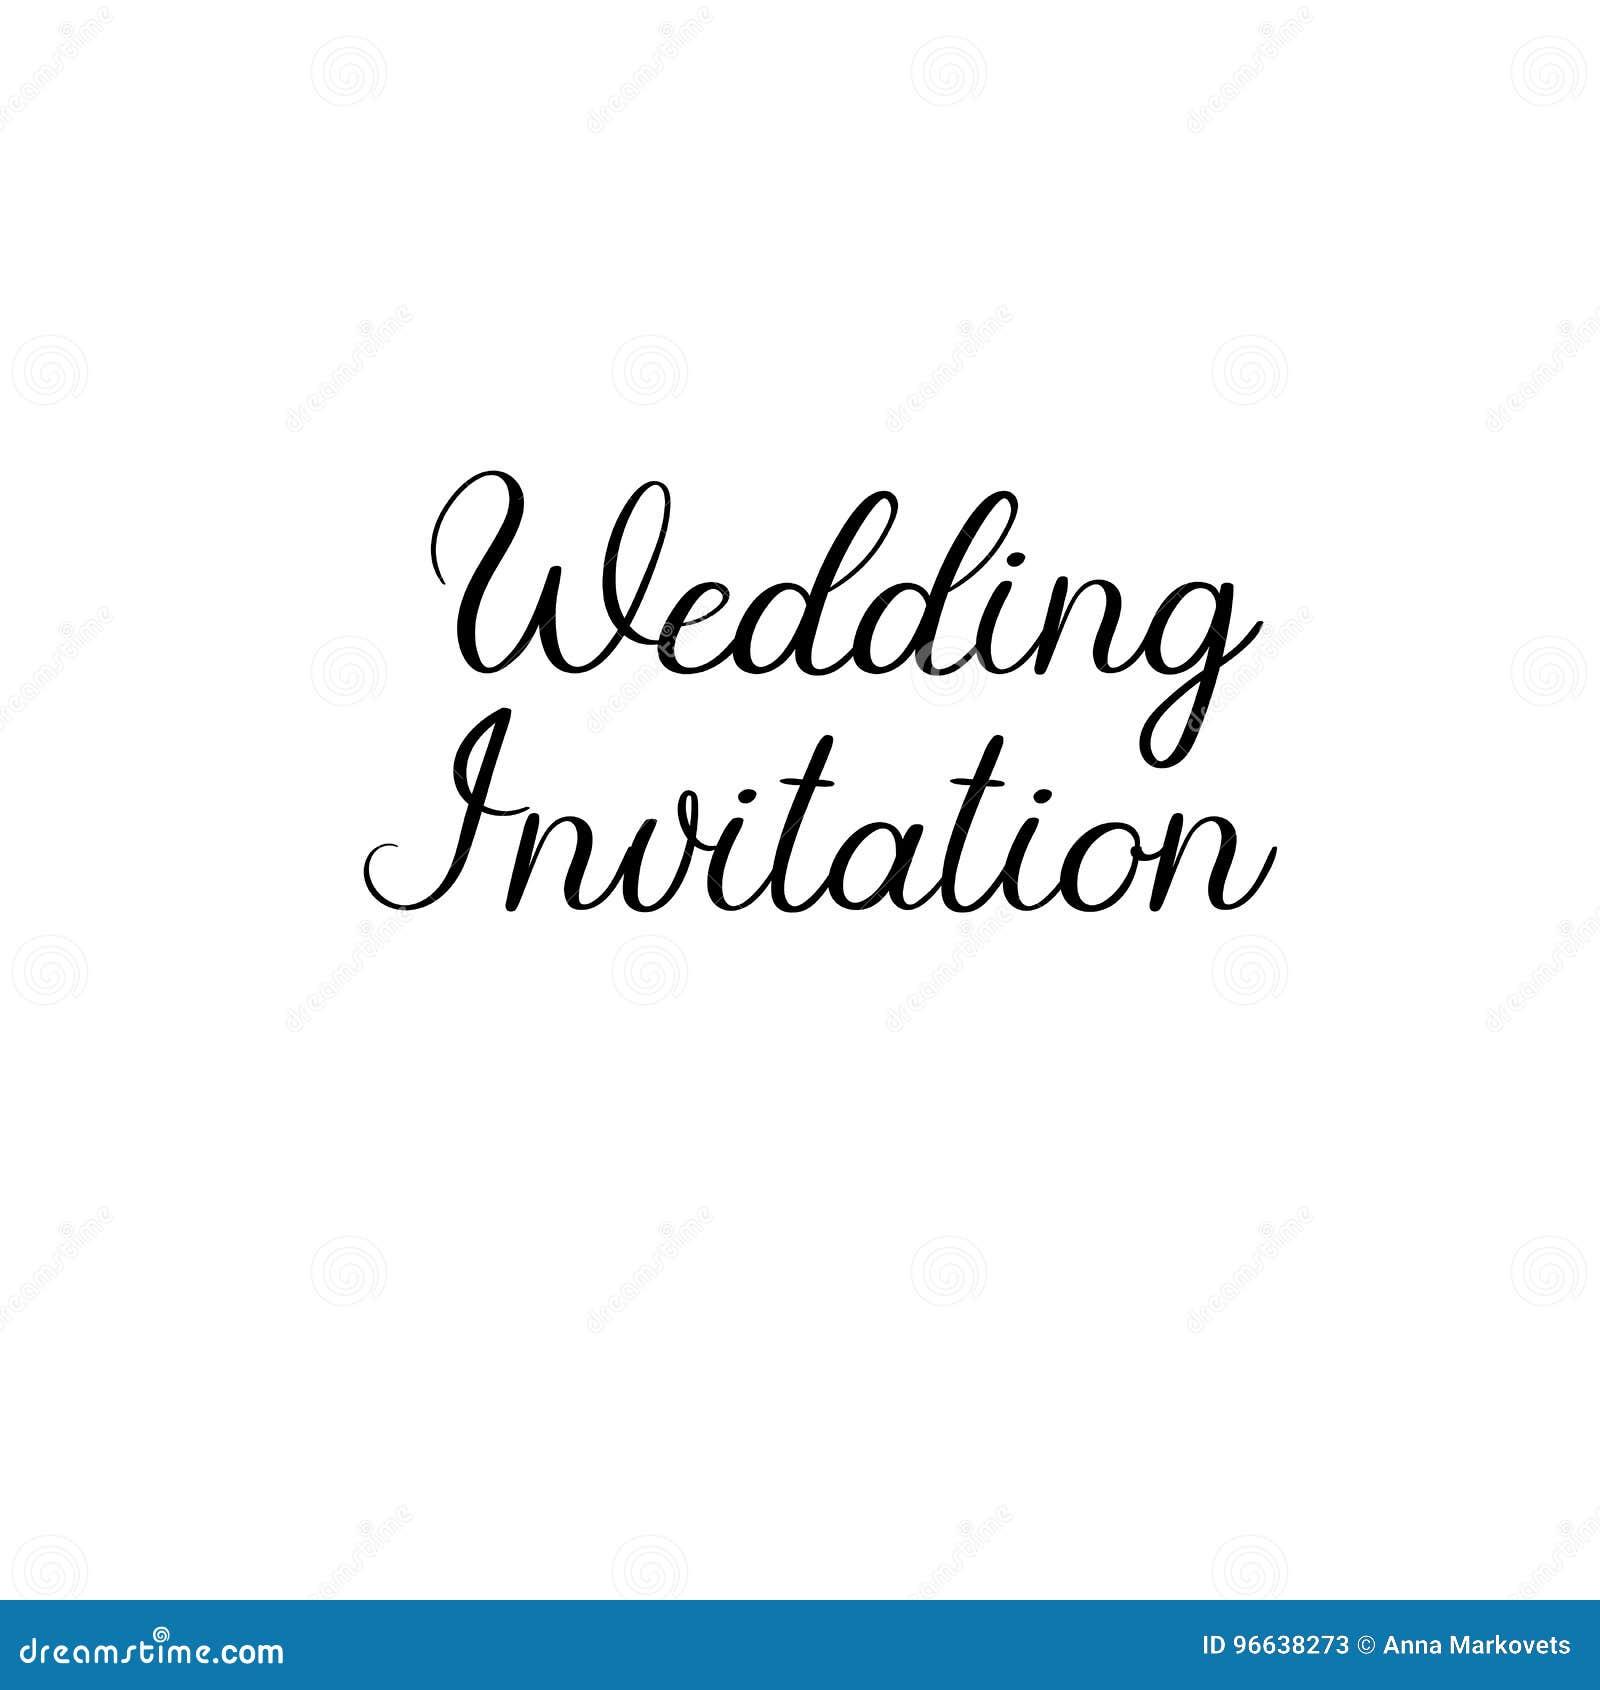 Wedding invitation handwritten calligraphy for greeting cards wedding invitation handwritten text calligraphy inscription for greeting cards wedding invitations vector brush calligraphy wedding phrase stopboris Gallery